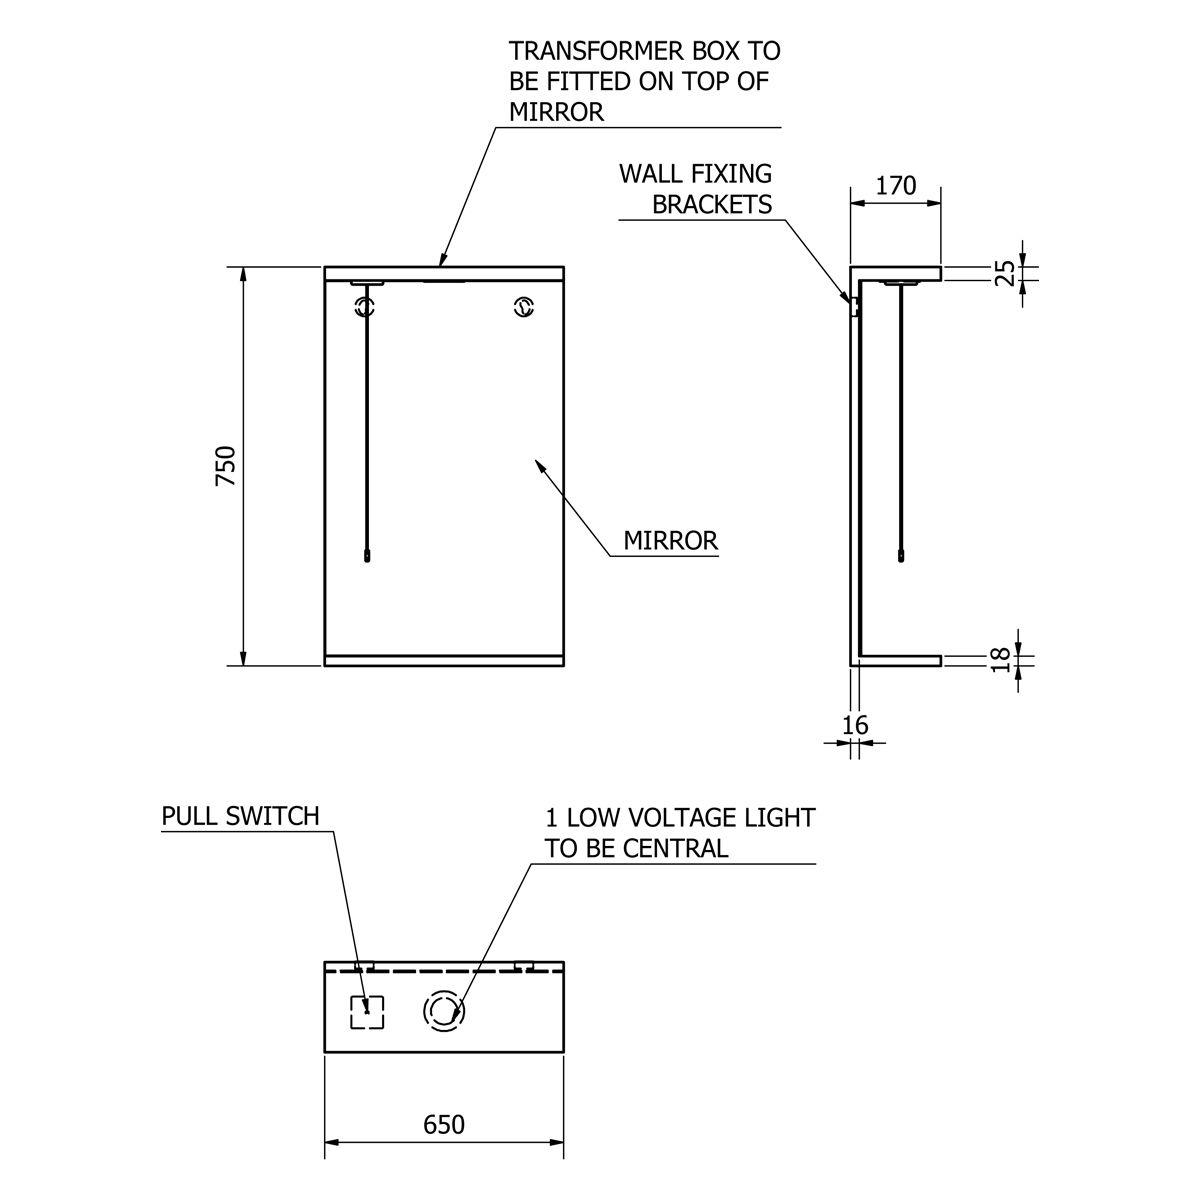 Kartell Impakt Mirror and Light 650mm Dimensions